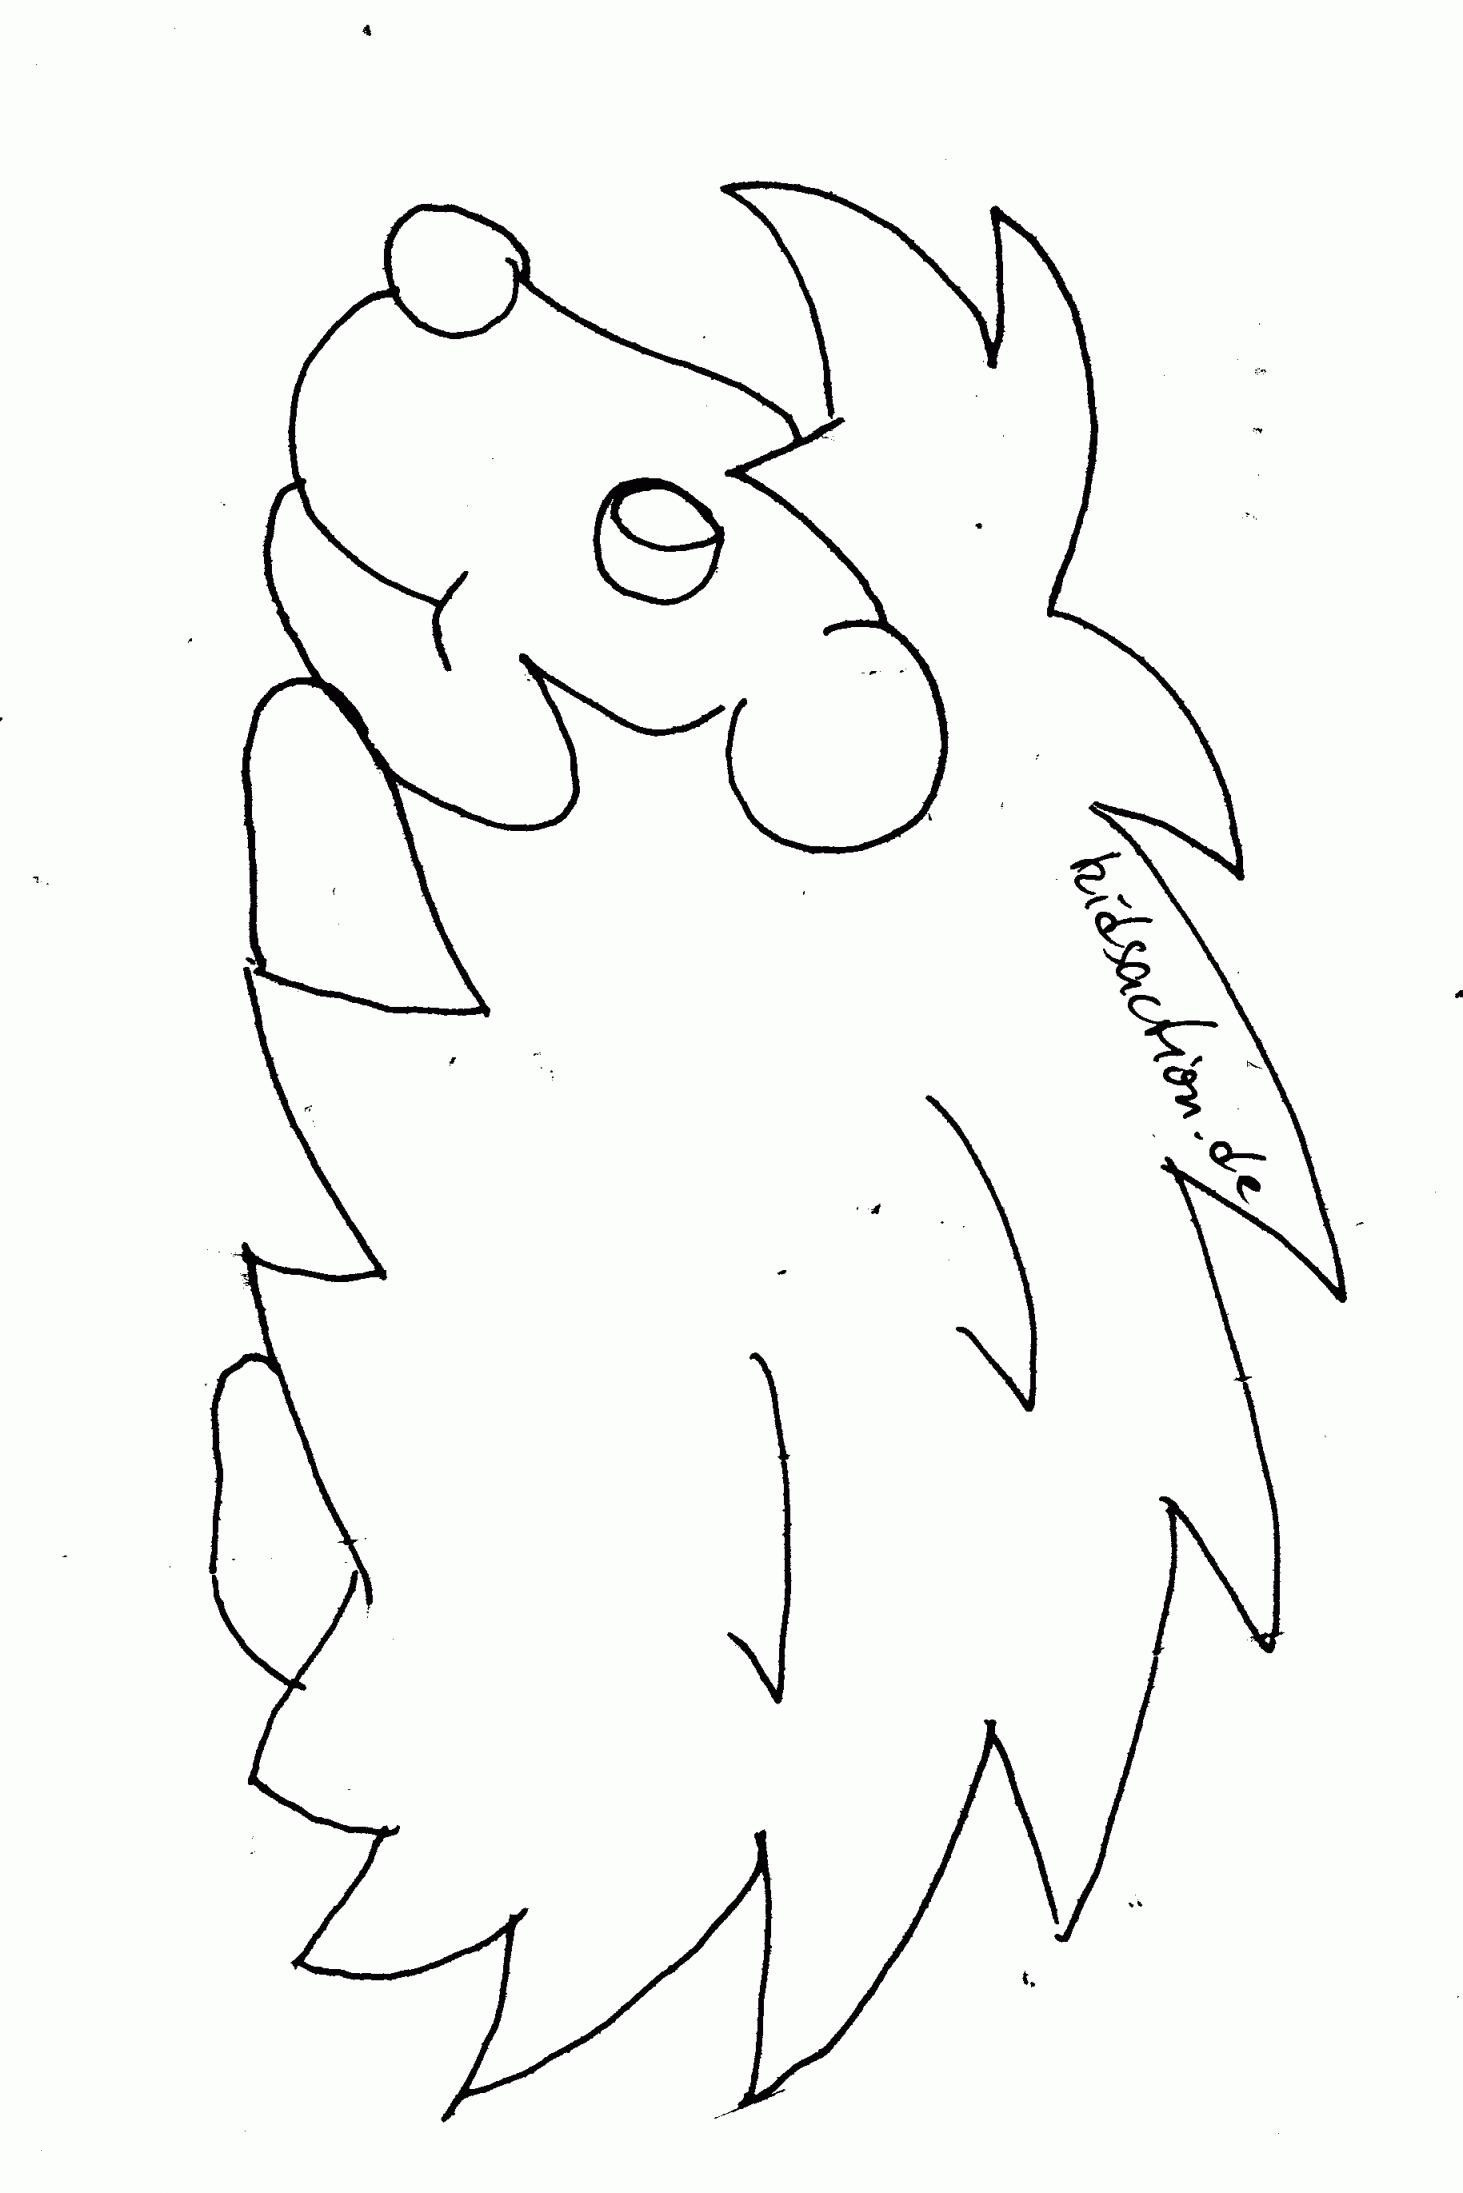 Ausmalbild Ninjago Lloyd Genial Malvorlagen Igel Elegant Igel Grundschule 0d Archives Uploadertalk Stock